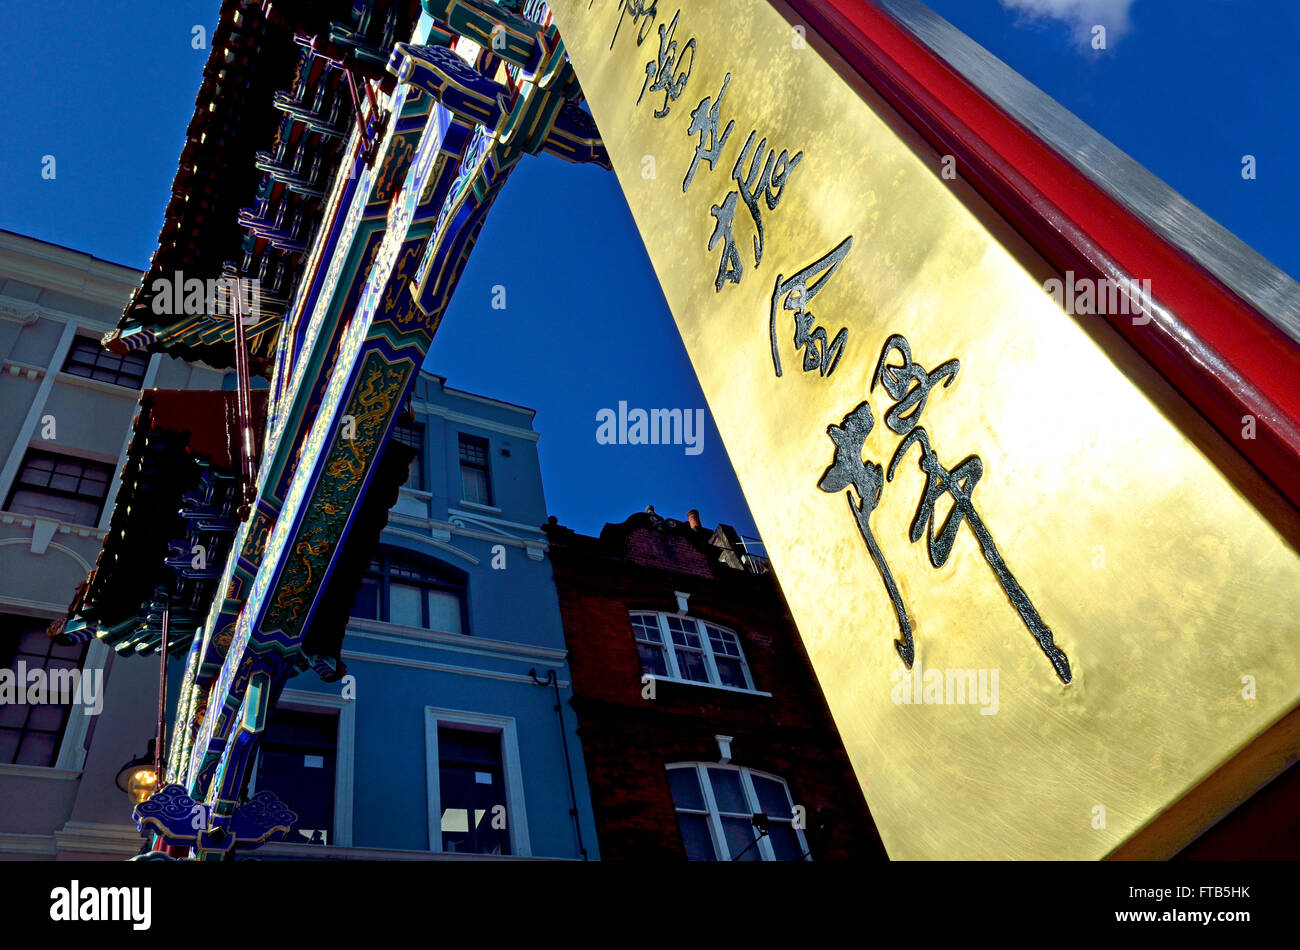 London, England, UK. New Gate (2016) to Chinatown on Wardour Street. - Stock Image